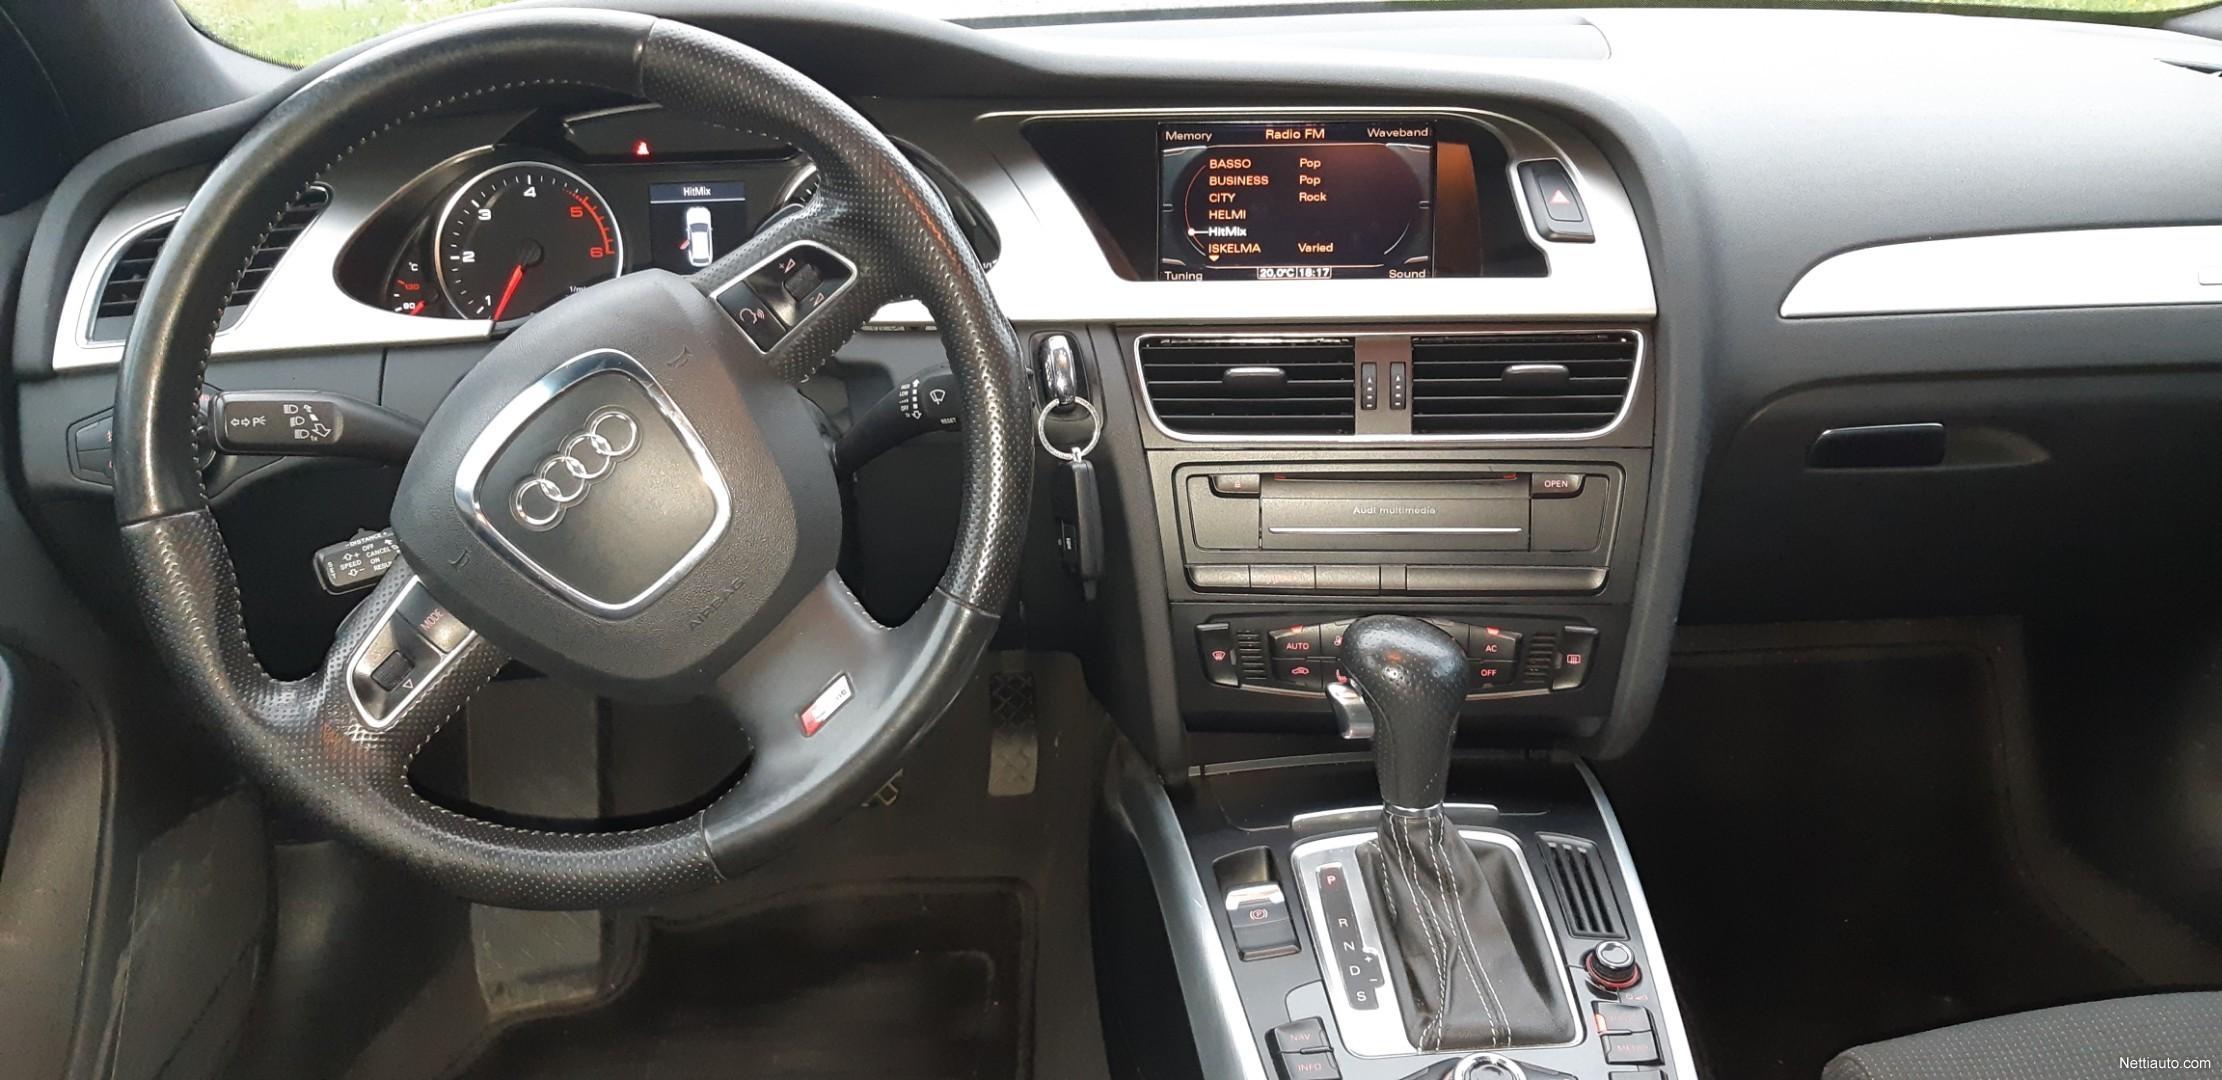 Audi A4 Avant 3 0 V6 TDI quattro S tronic Webasto Rahoitus Station